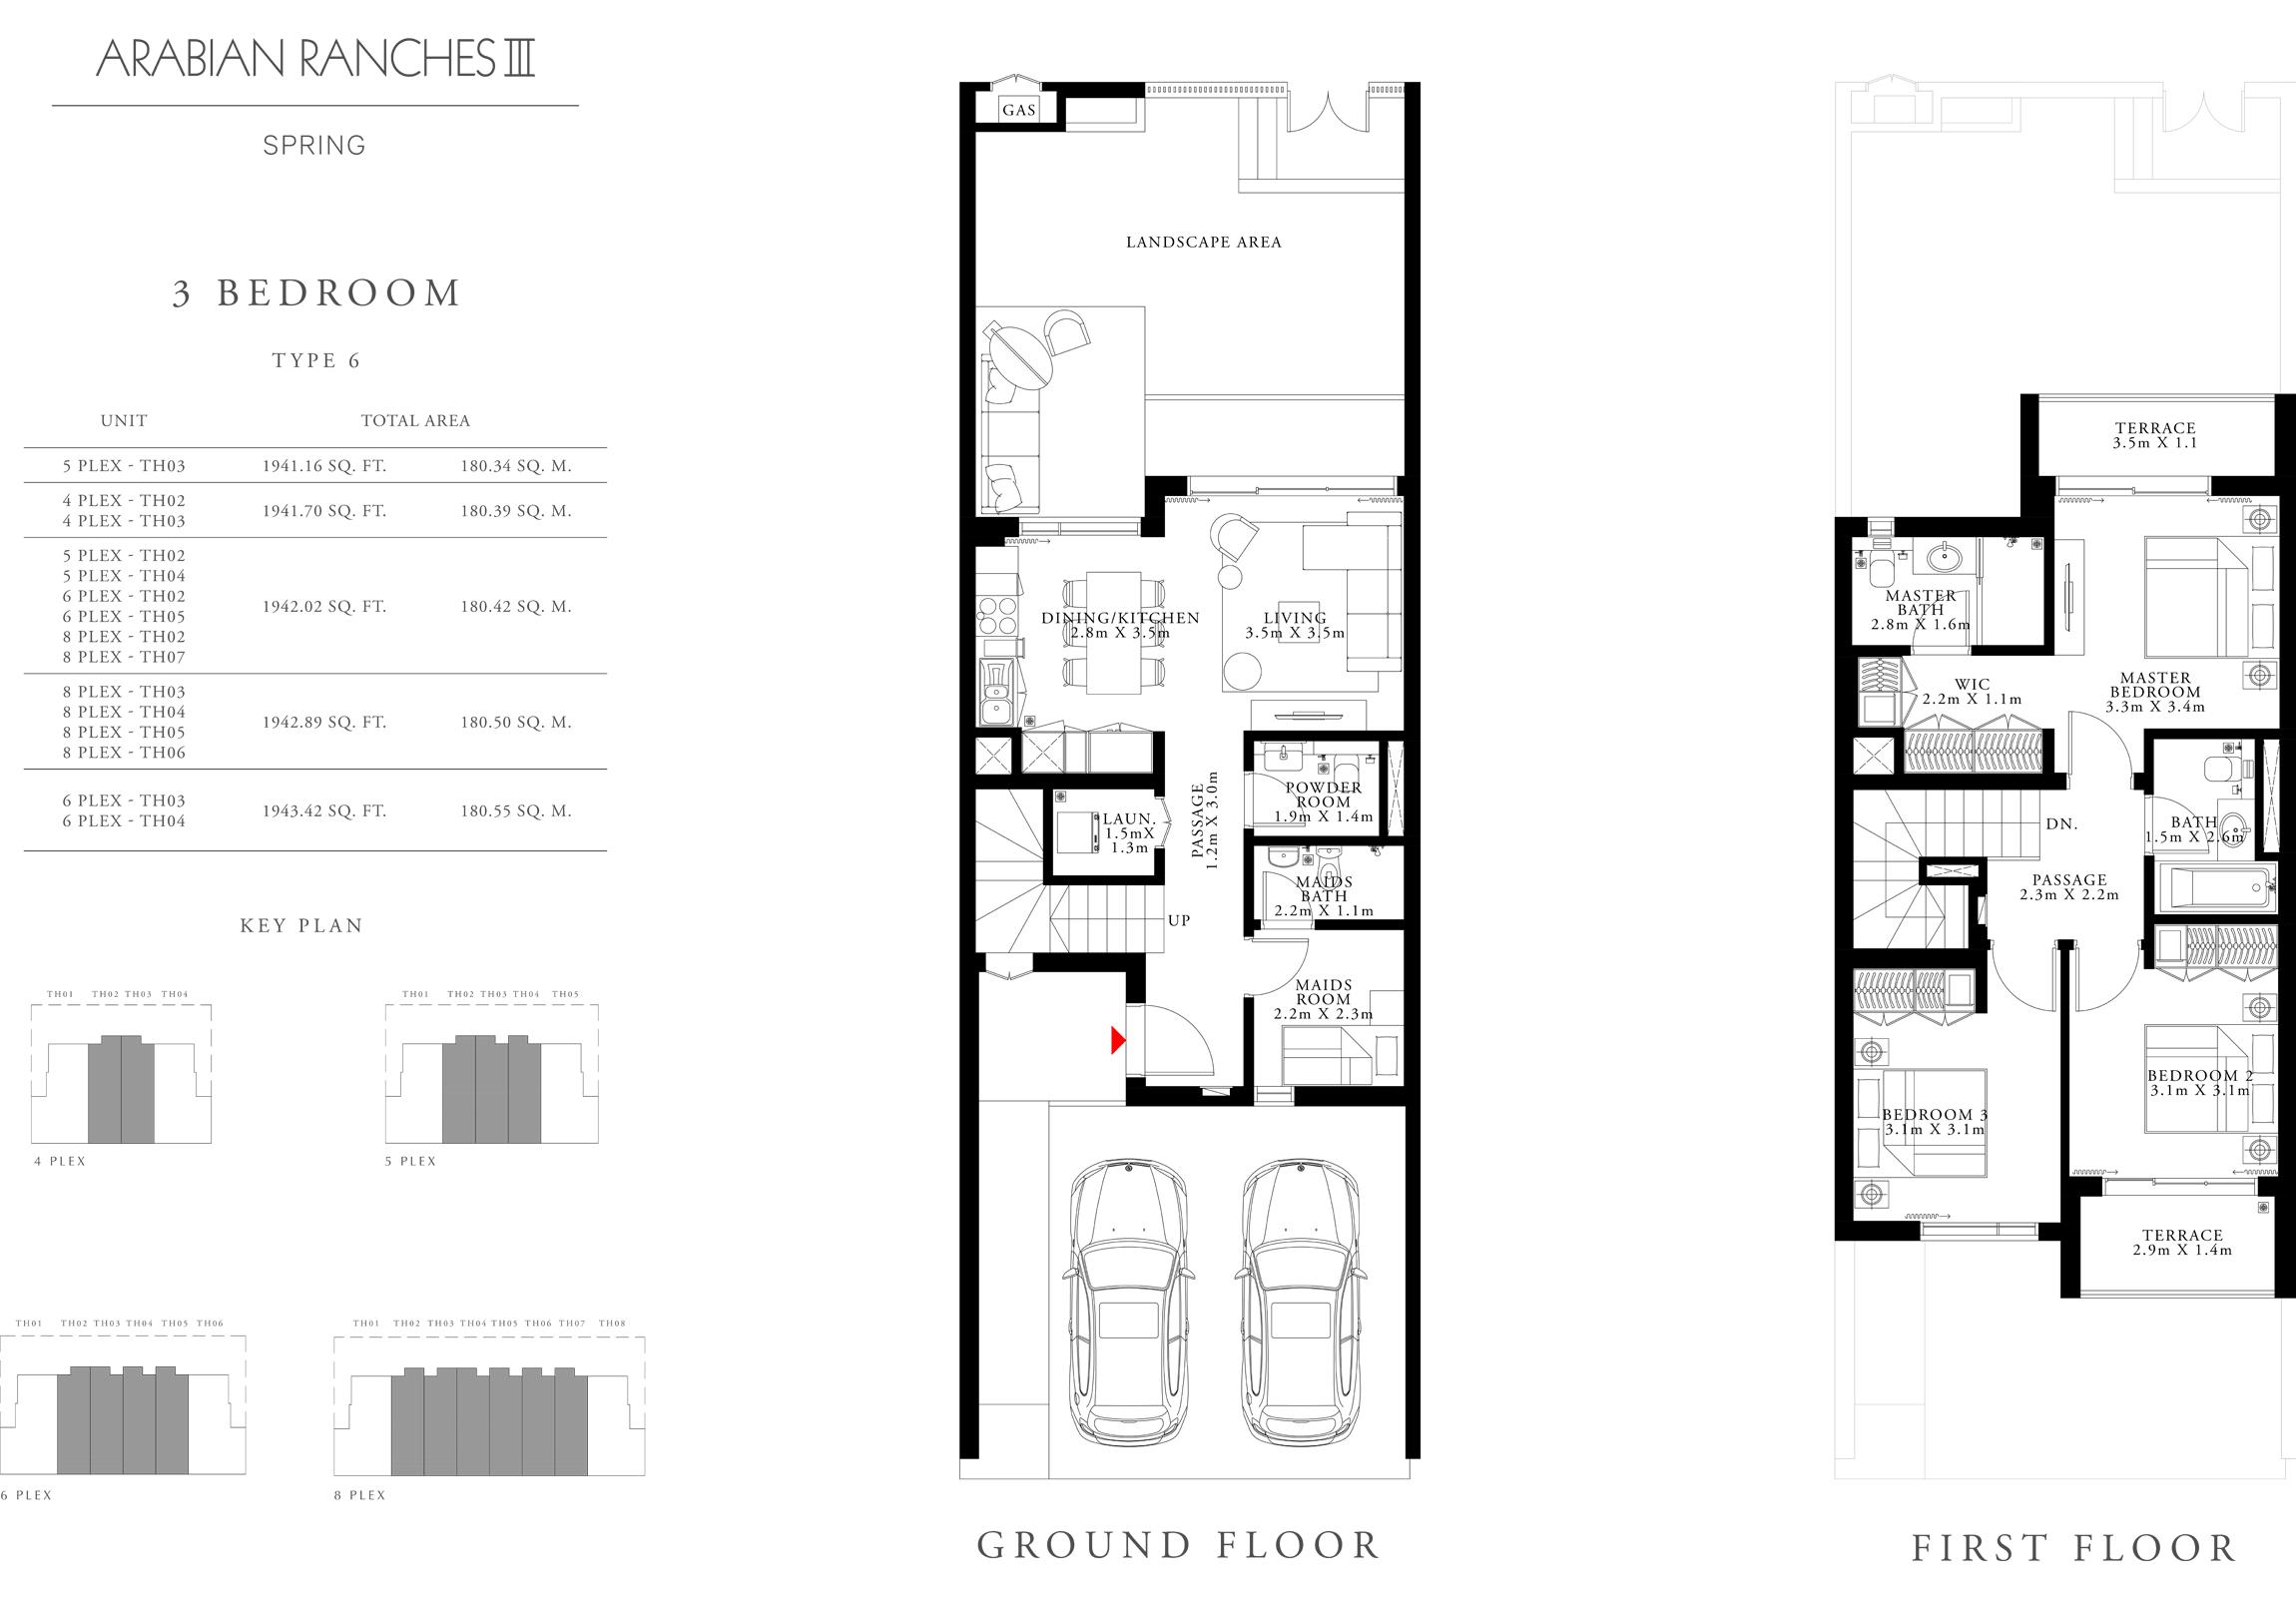 3 Bedroom Type 6 Size 1943.42 sq.ft